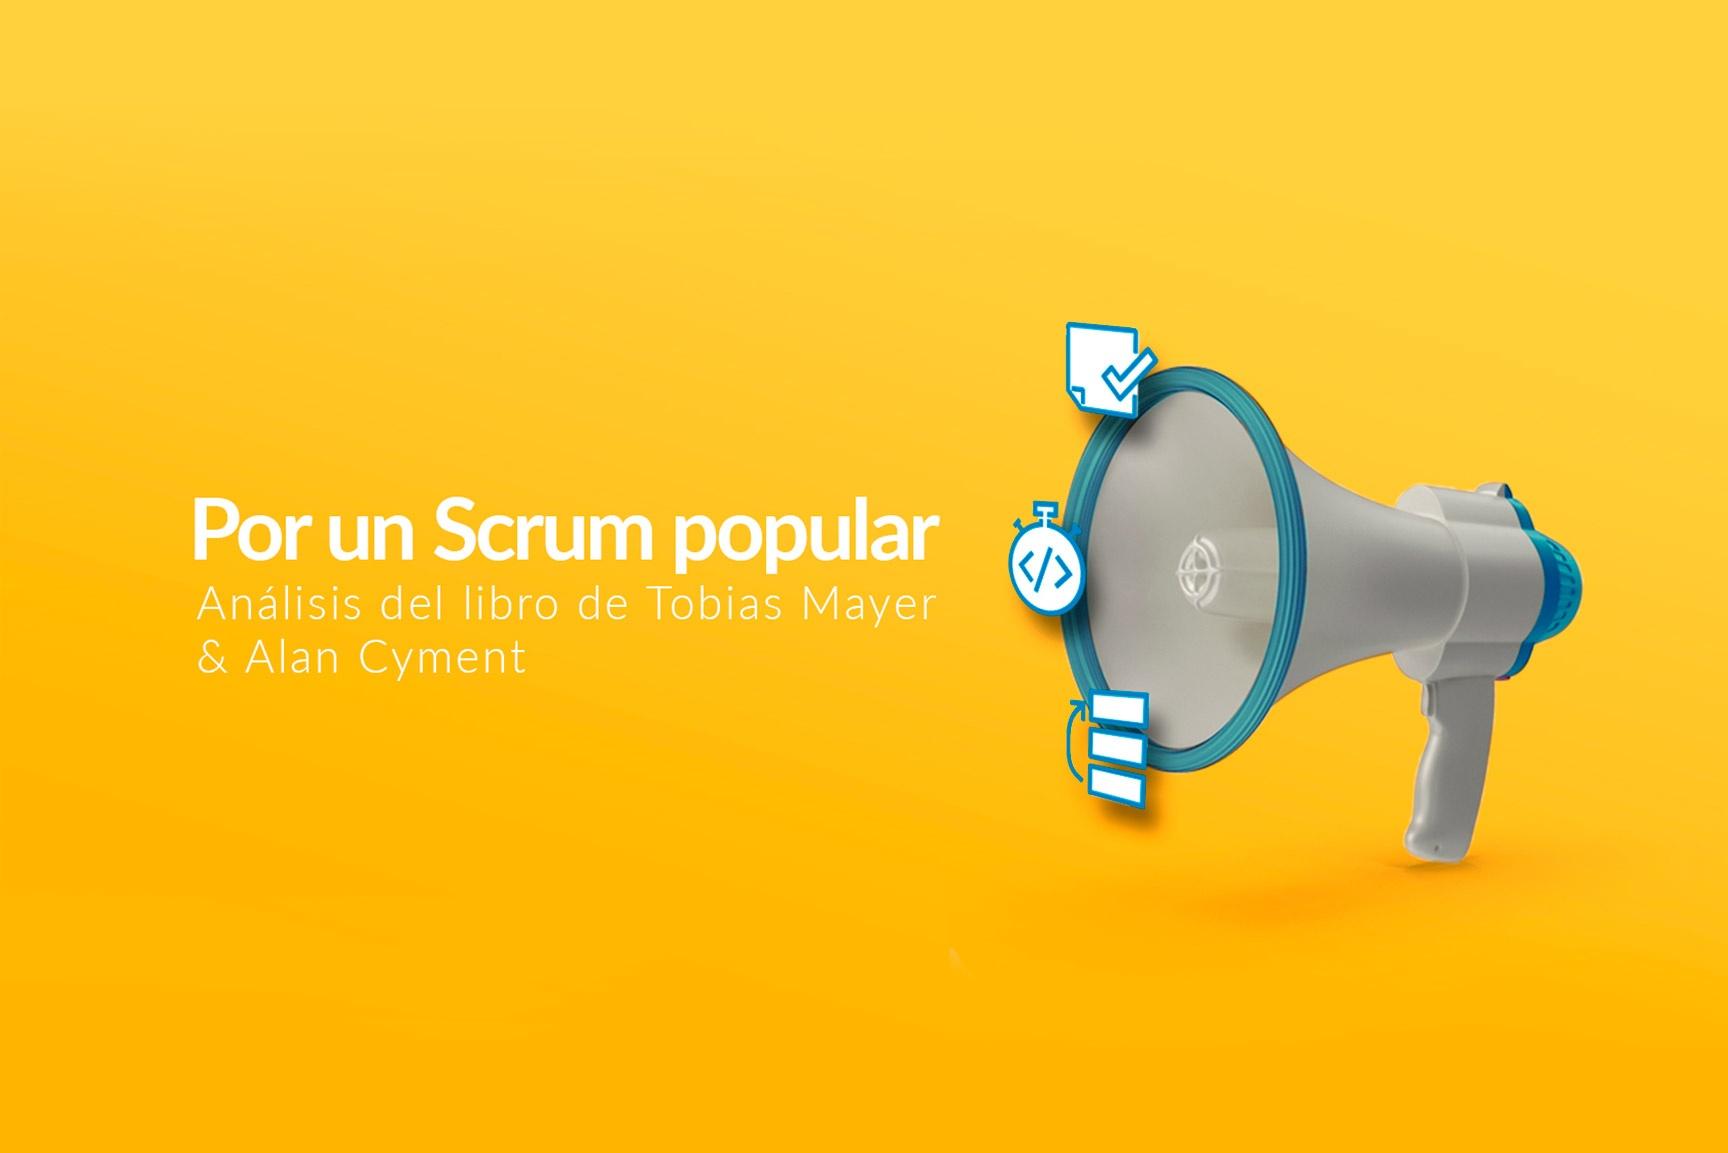 h_por_un_scrum_popular_por_un_mundo_mejor.jpg